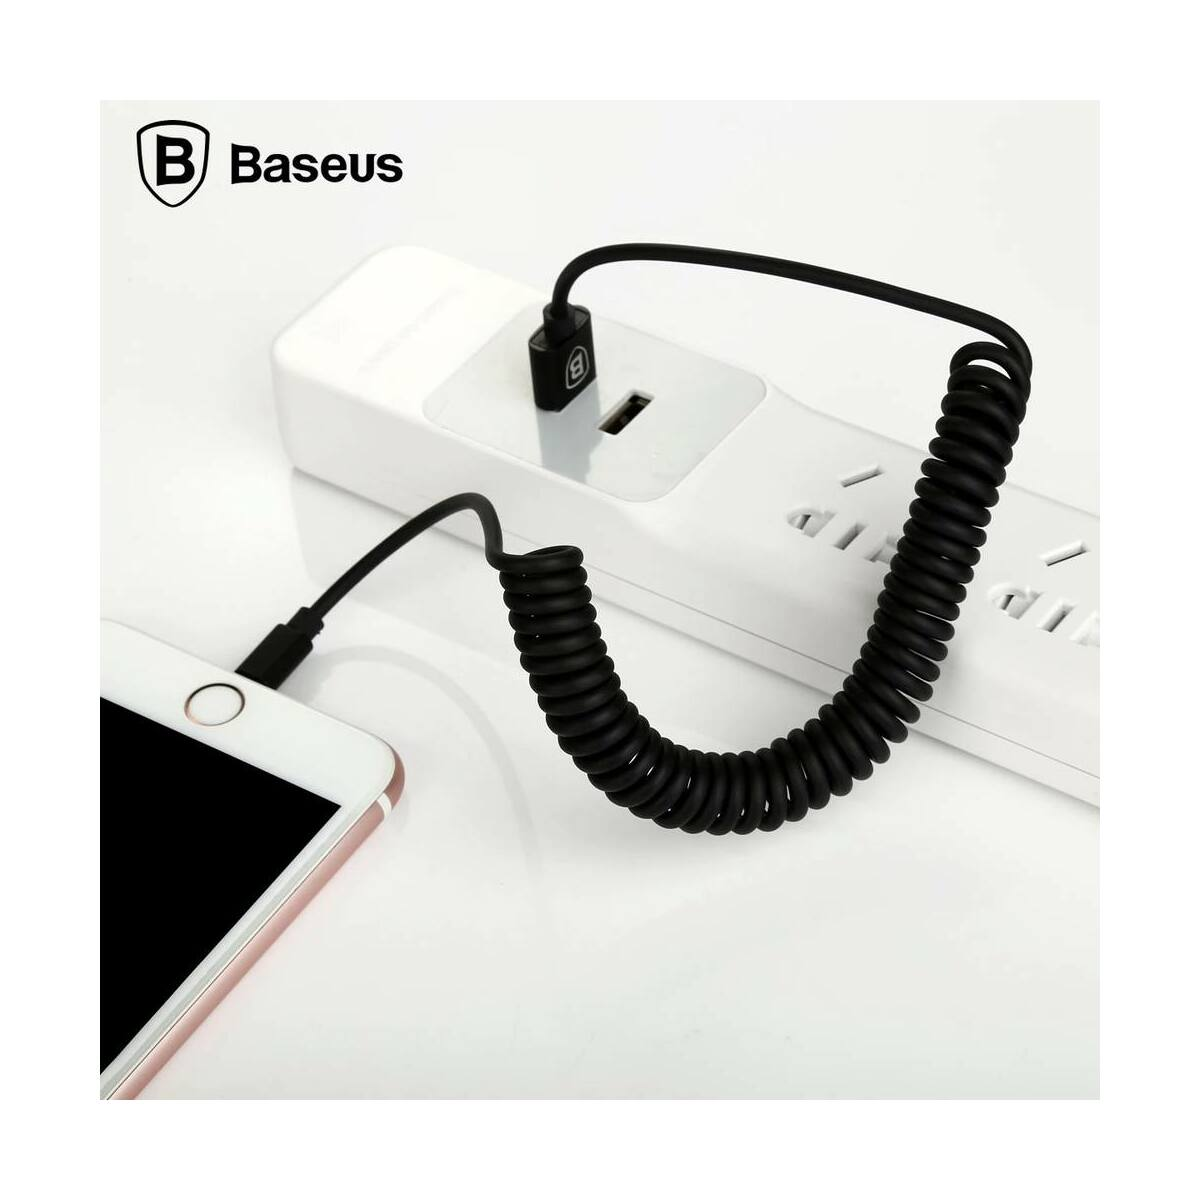 Baseus Lightning kábel, Elastic rugalmas adatkábel, 1.8A, 1.6m, fekete (CALIGHTNG-EL01)